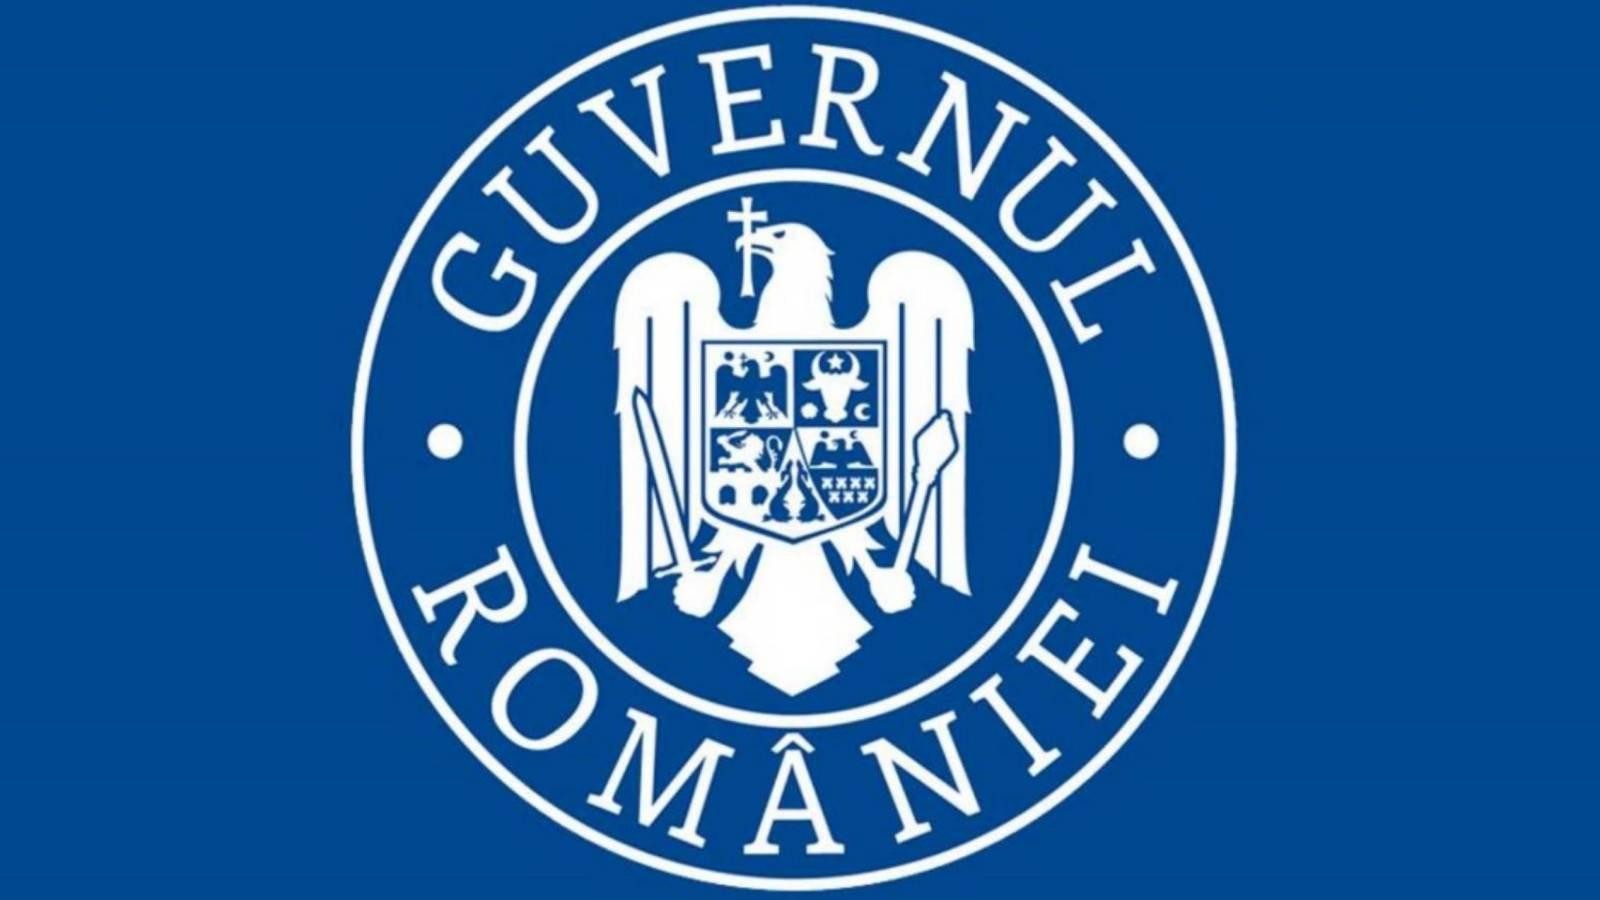 Guvernul Romaniei alerta cibernetica emotet